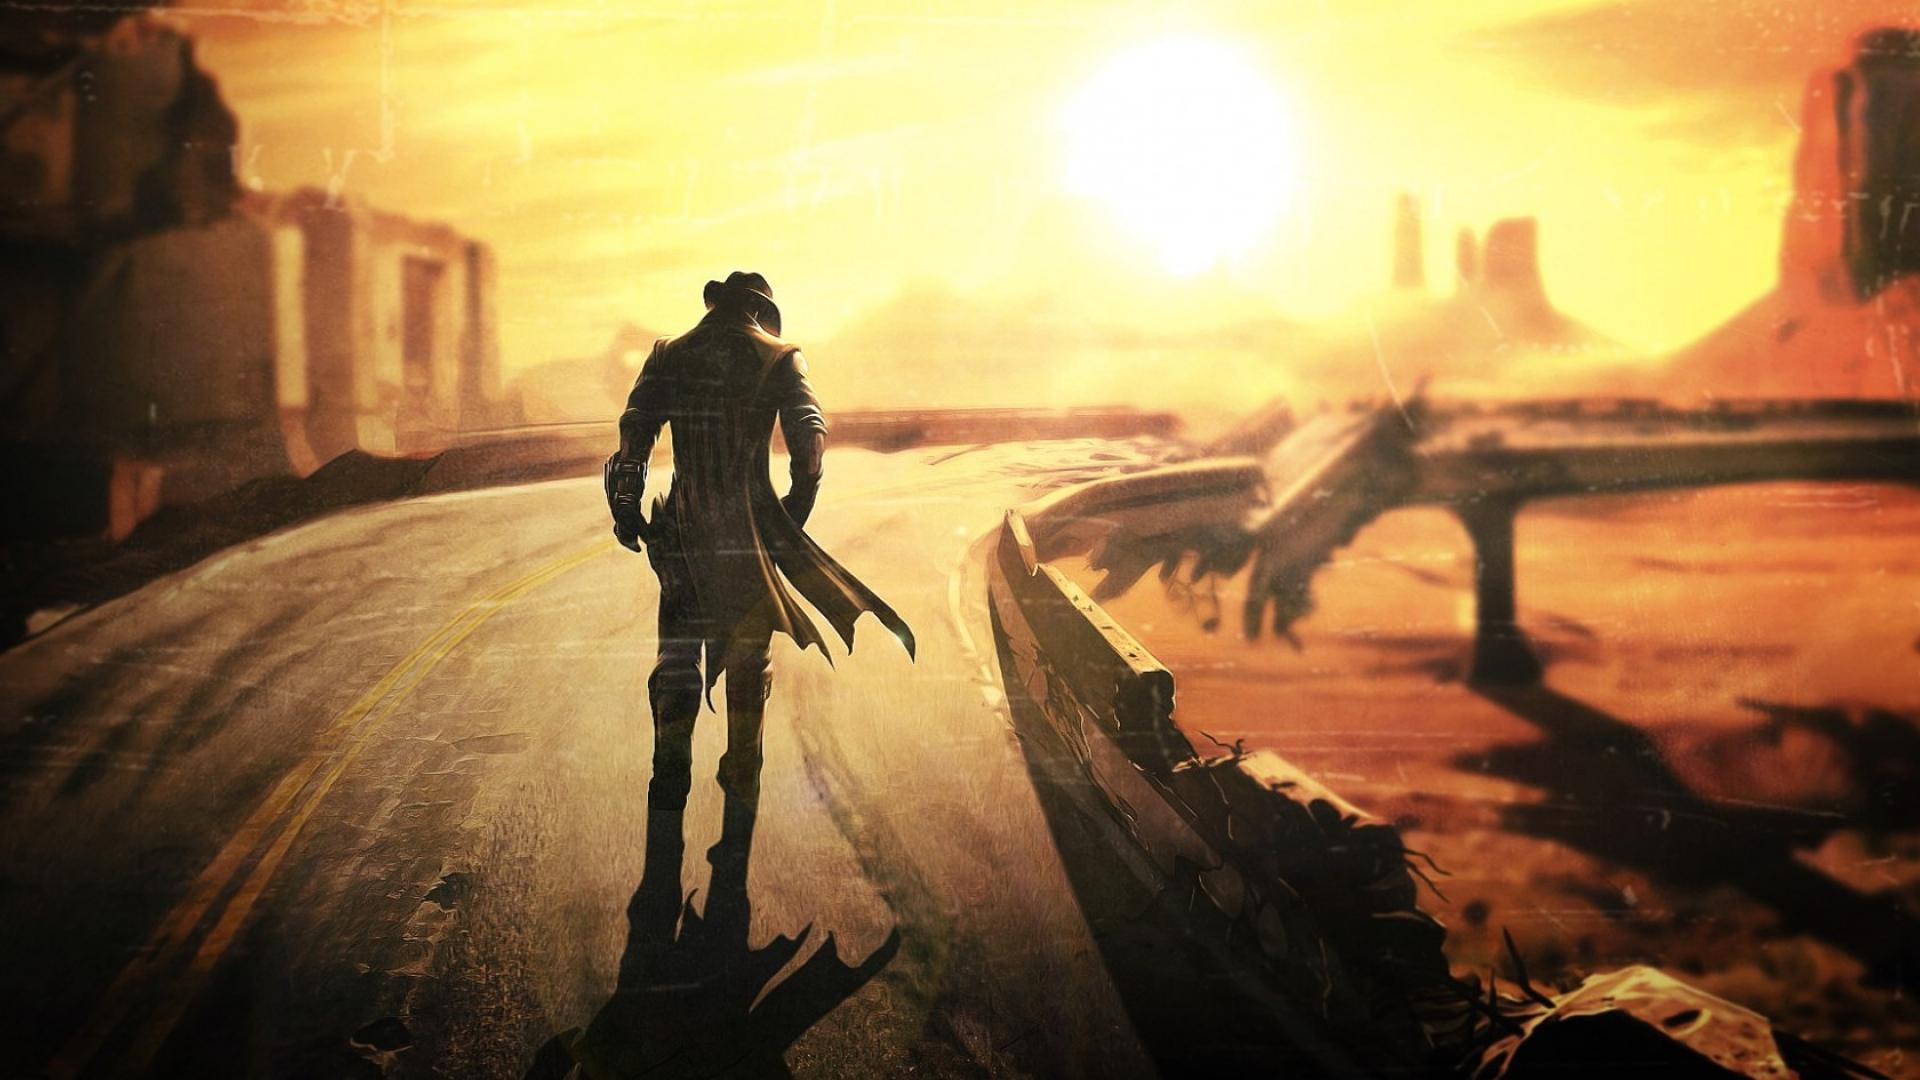 Background Fallout 4 Fallout New Vegas Post Apocalypse Game Wallpaper 1920x1080